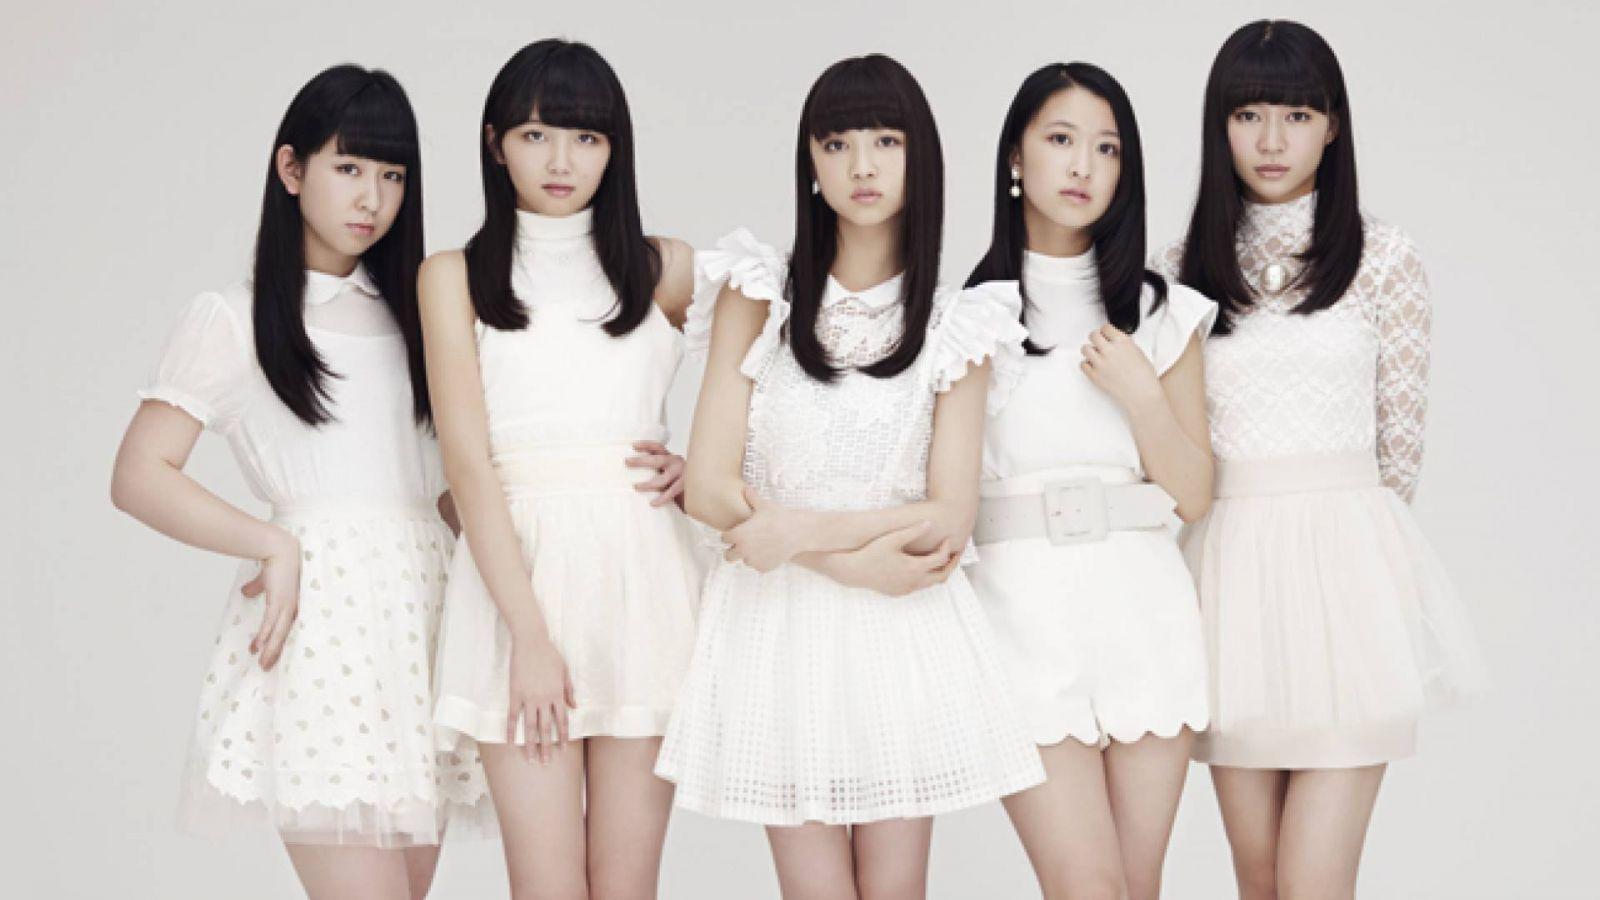 Konishi tauolle TOKYO GIRLS' STYLEsta © TOKYO GIRLS' STYLE